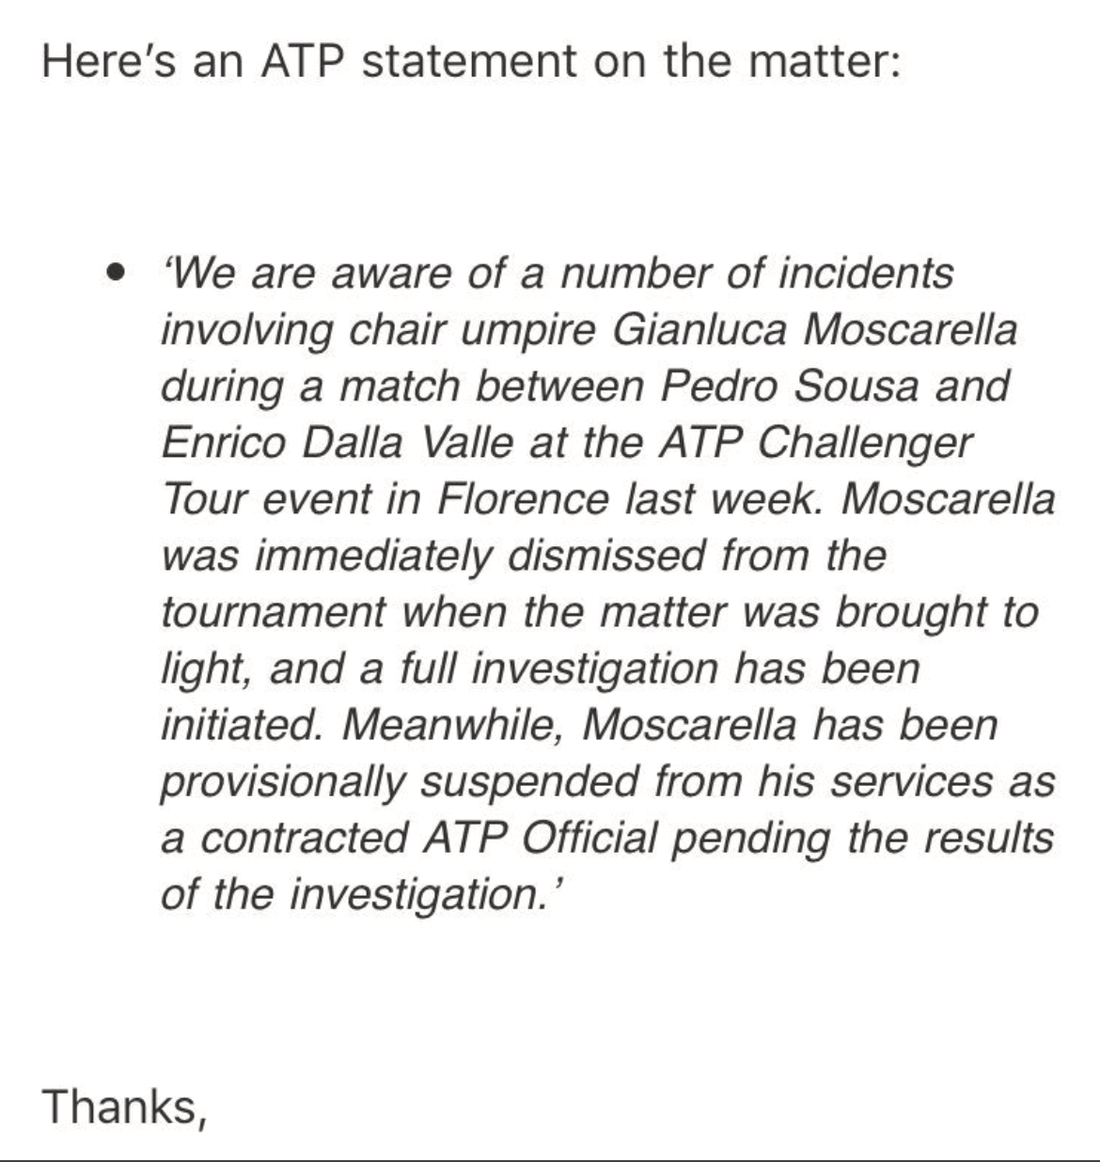 ATP:s uttalande om Gianluca Moscarella